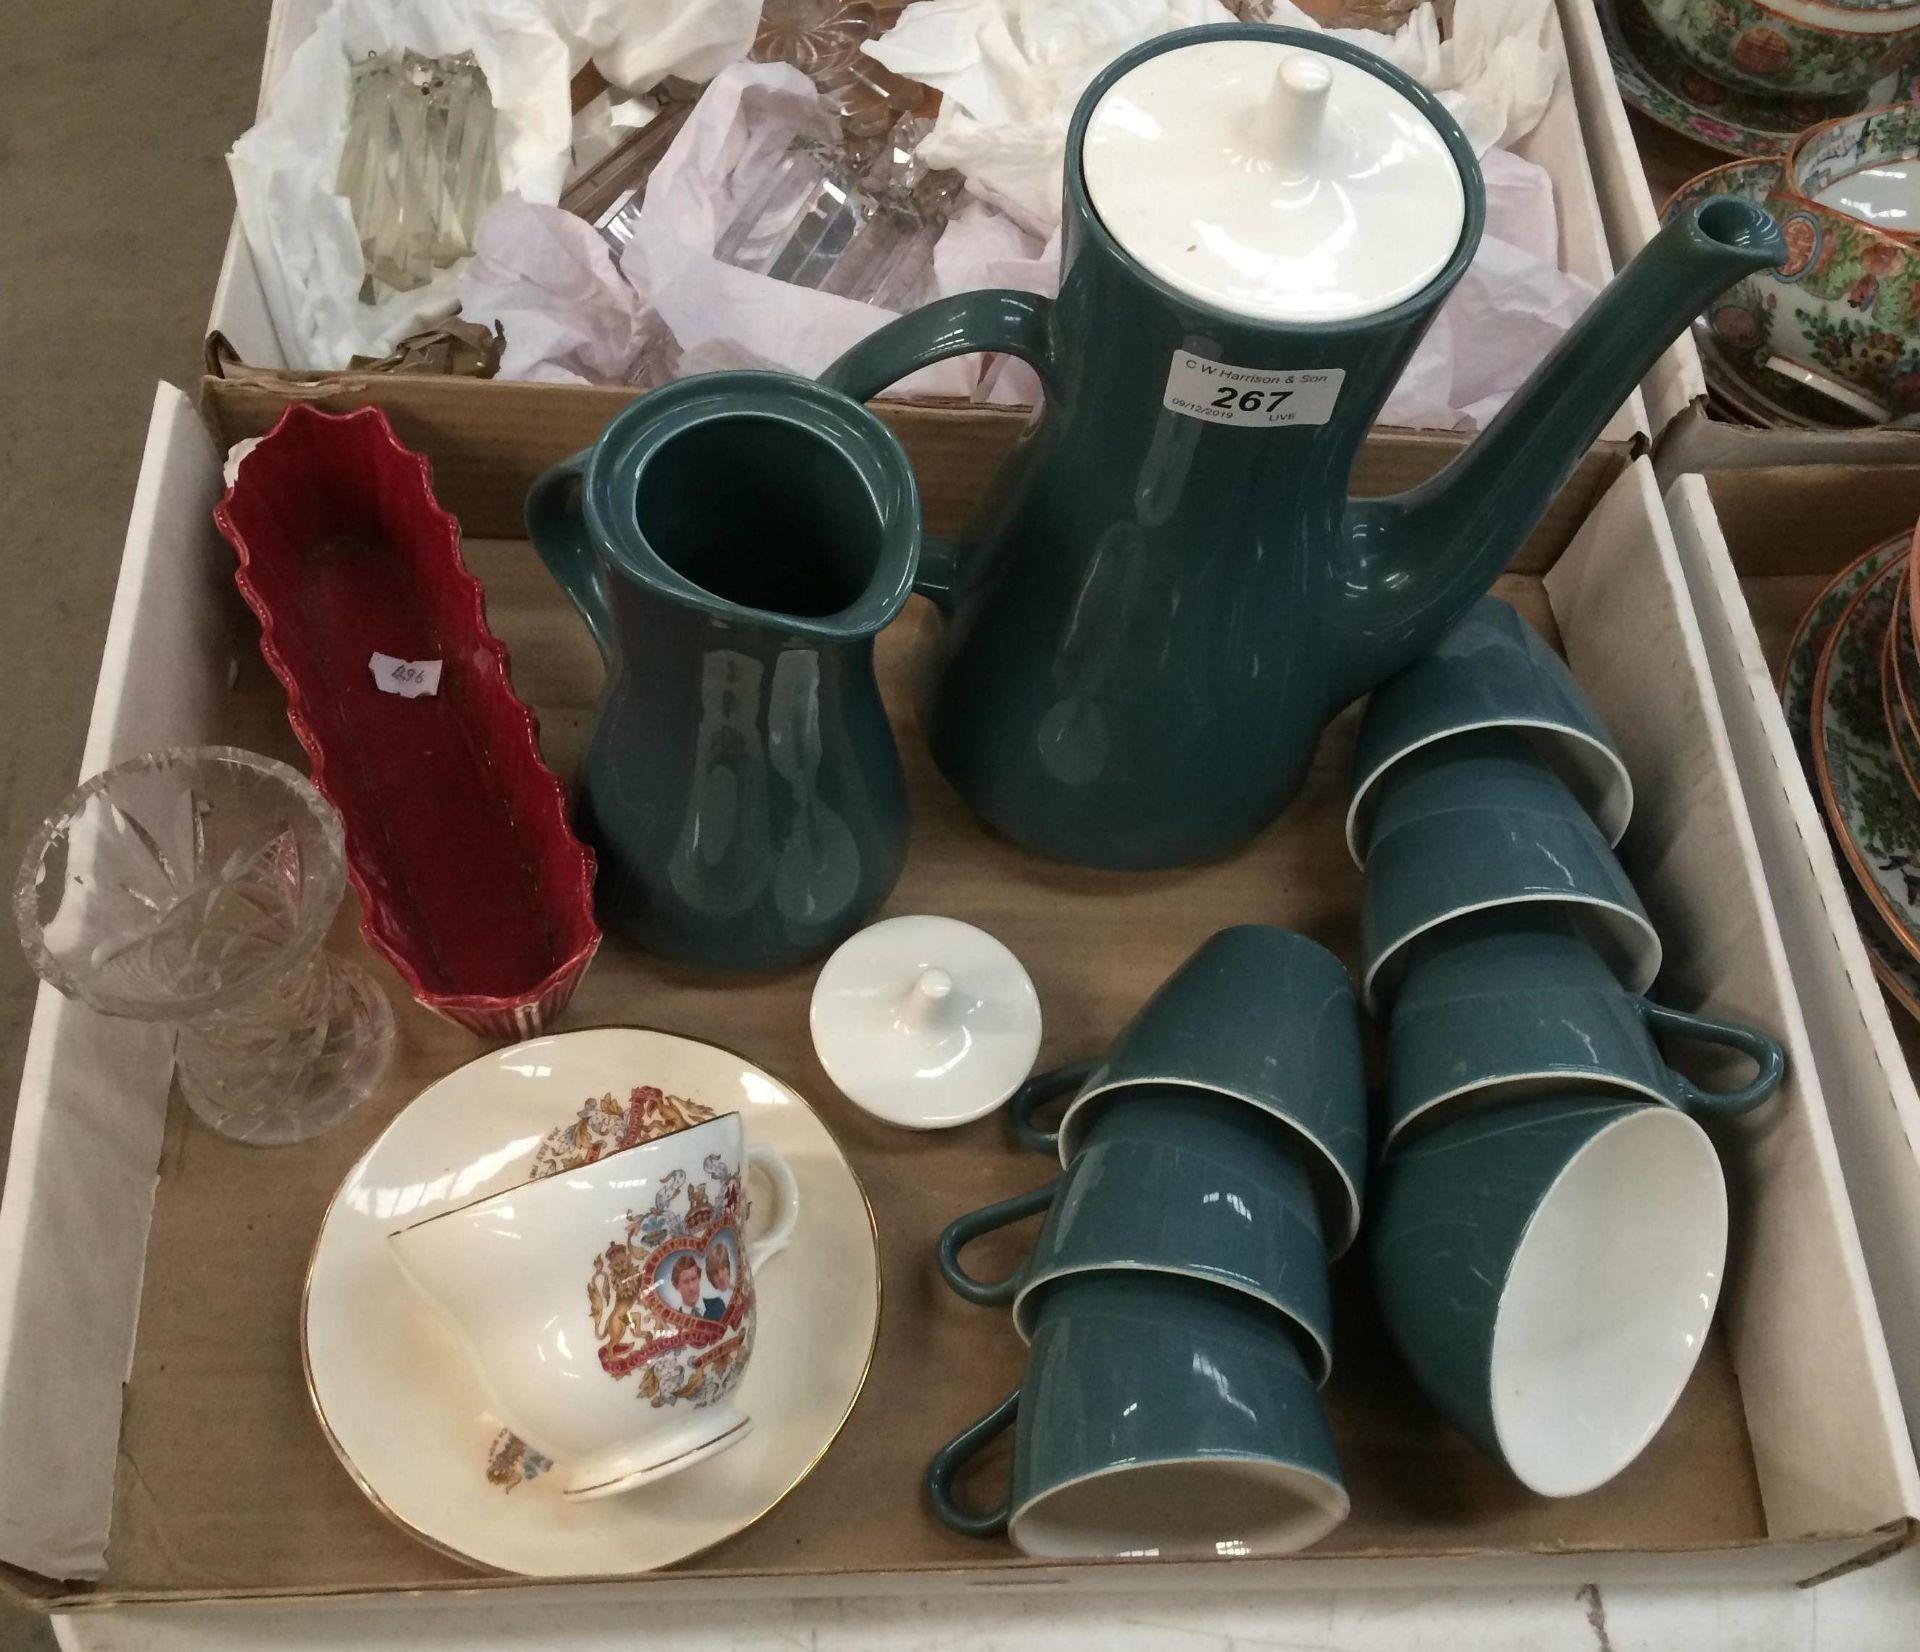 Lot 267 - Poole Pottery coffee pot, milk jug,